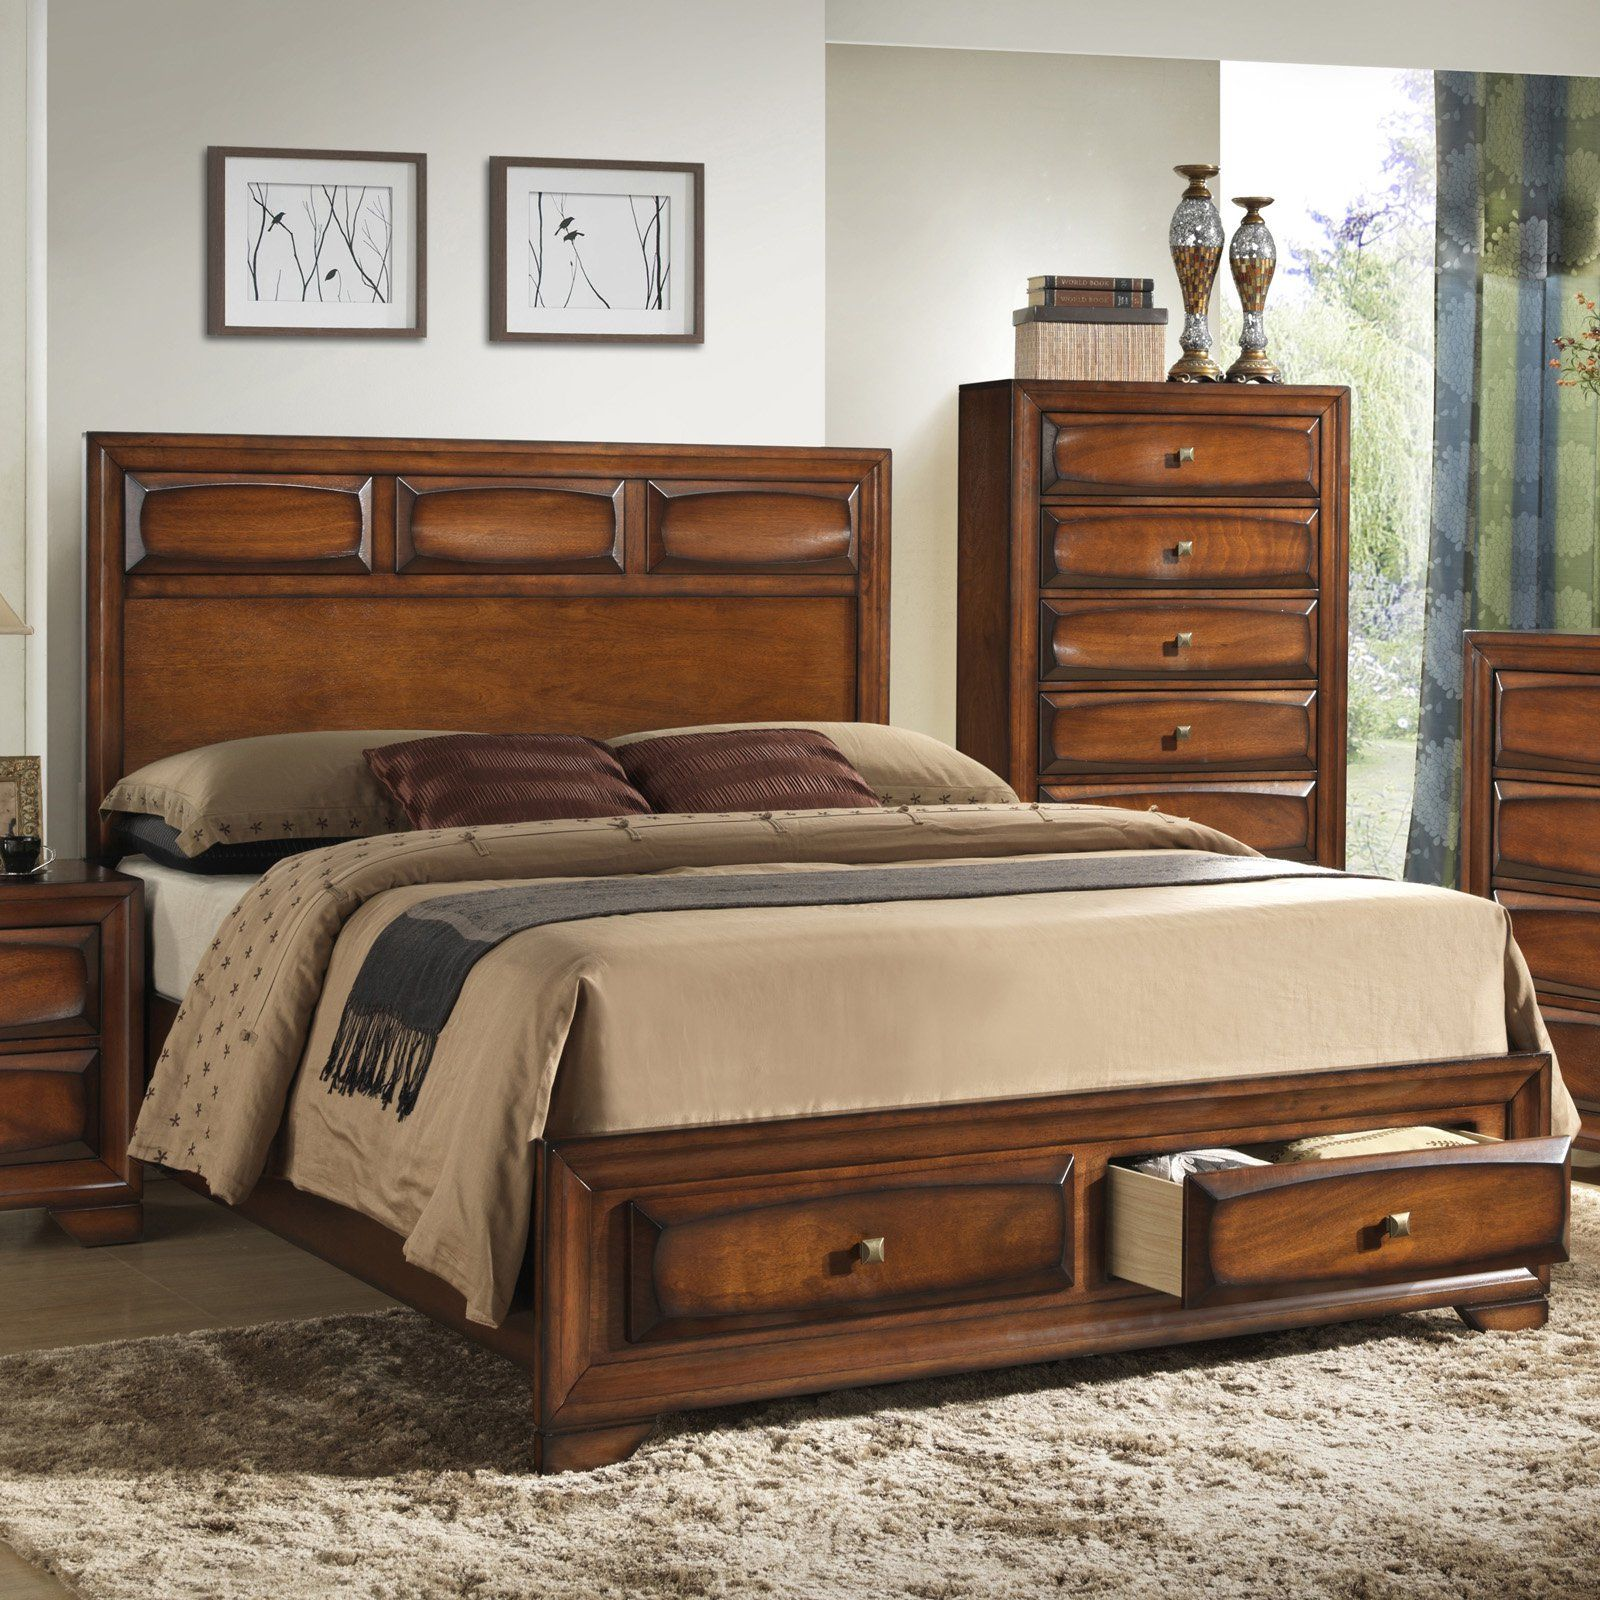 Roundhill Furniture Oakland Storage Platform Bed, Size